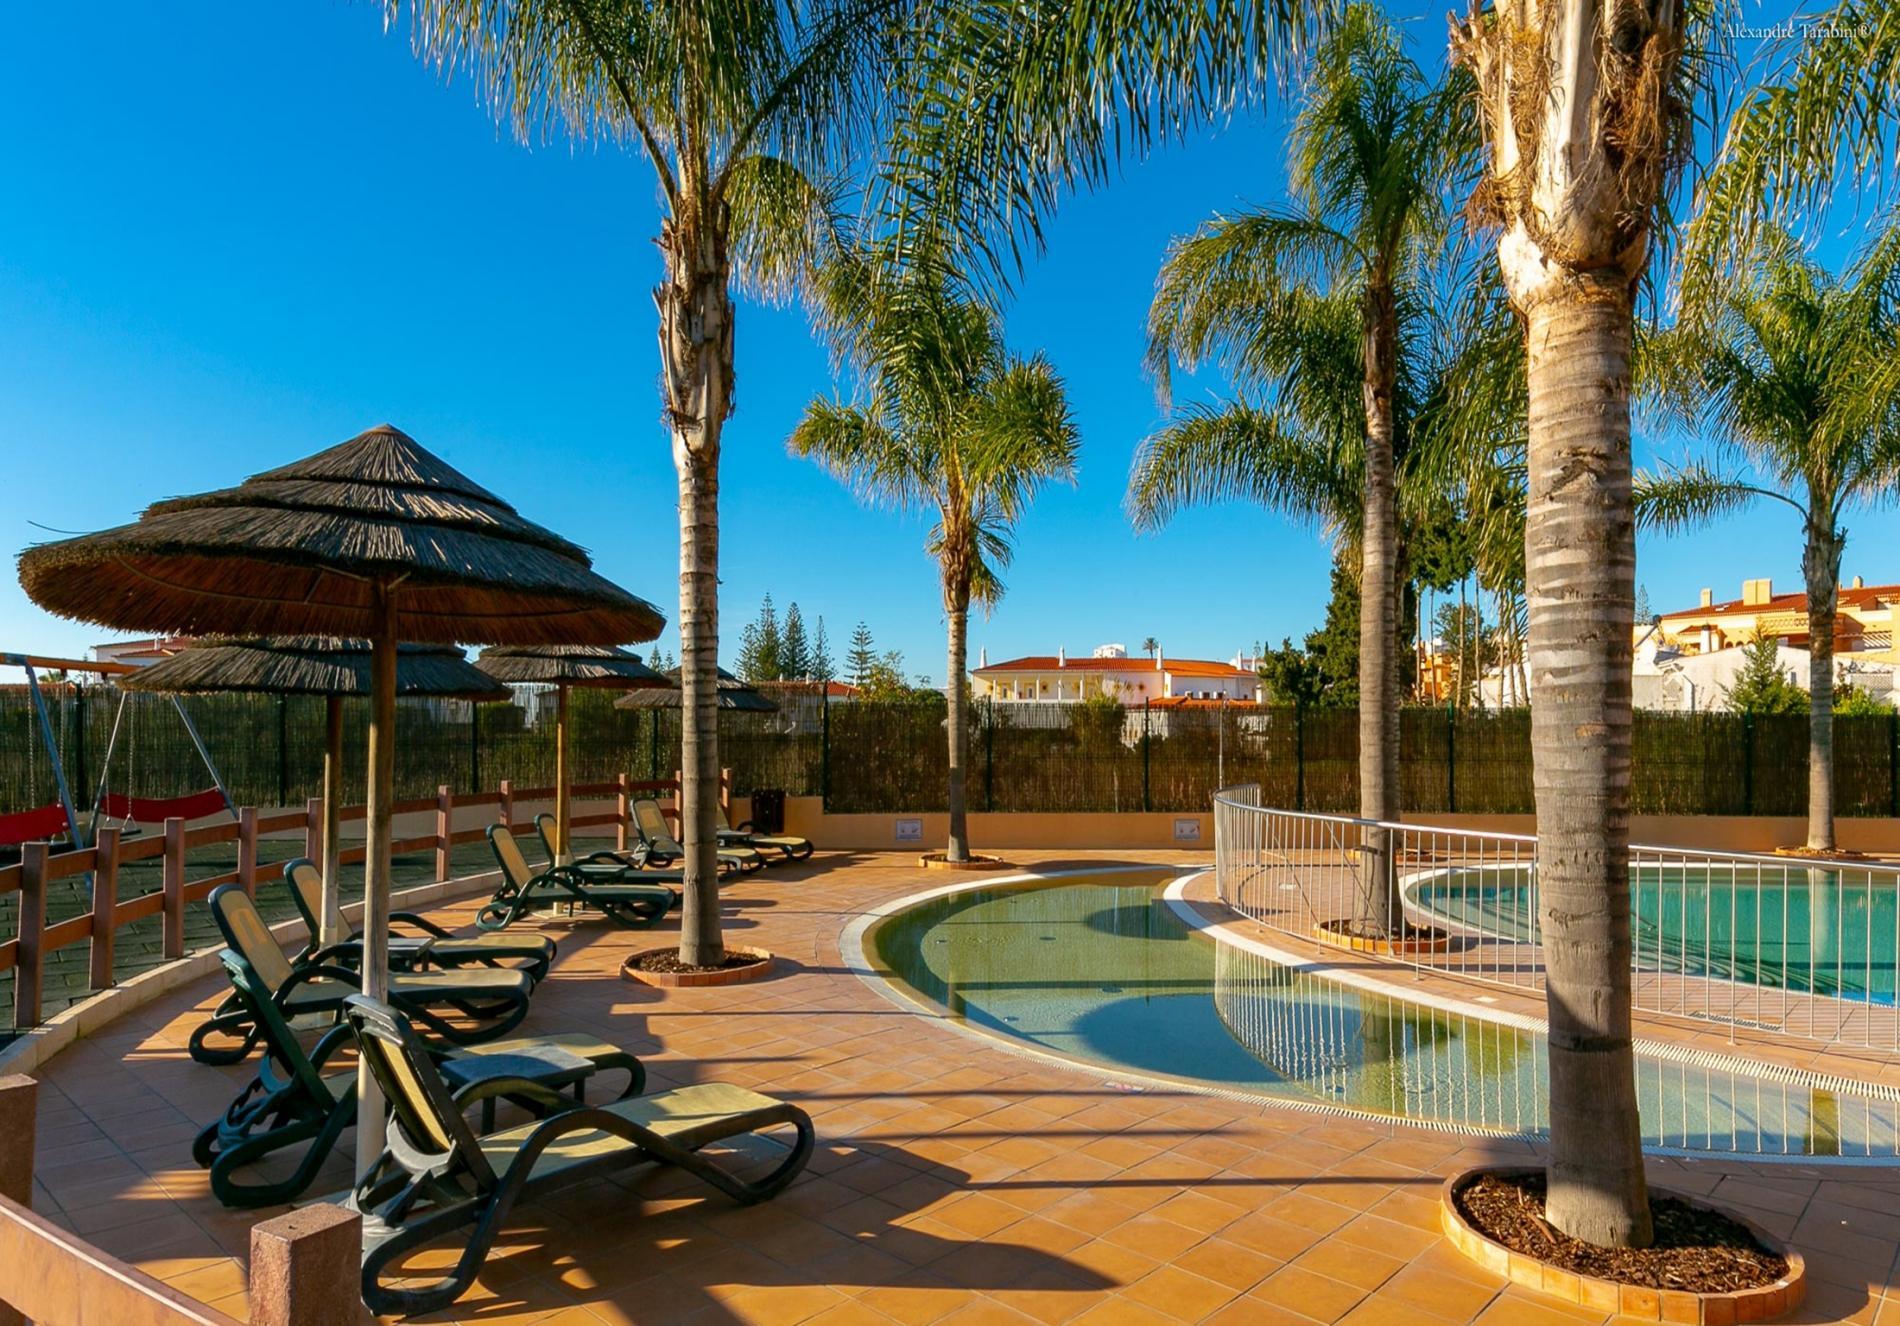 Ferienwohnung A24 - LuzBay Beach Apartment (2558091), Luz, , Algarve, Portugal, Bild 30